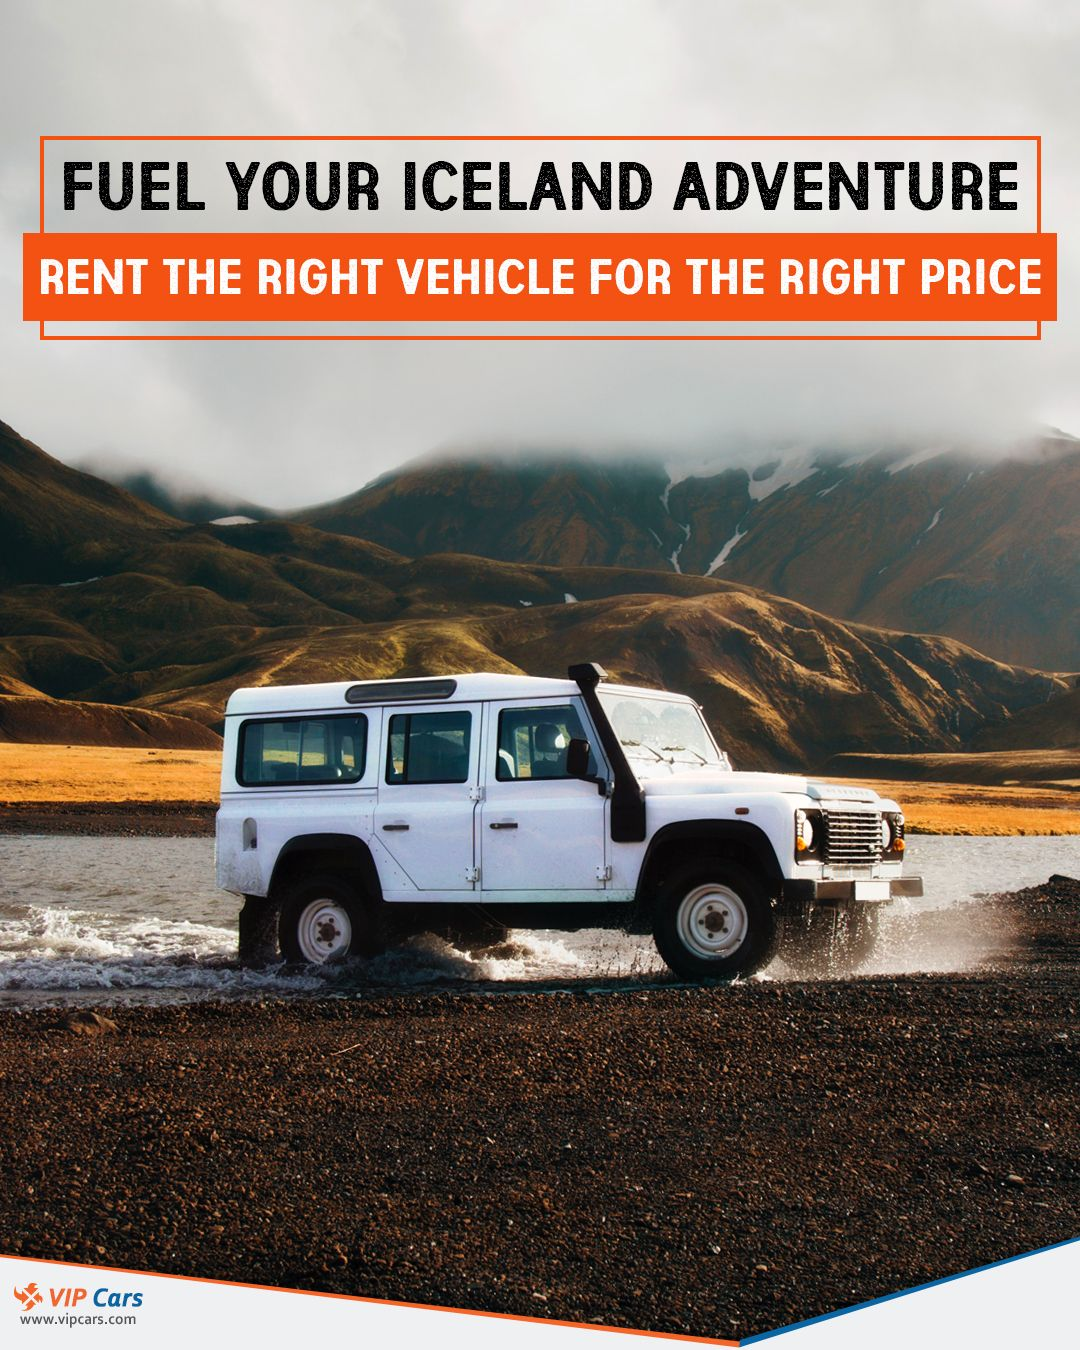 Iceland Vipcars Carrental In 2020 Car Rental Car Rental Company Luxury Car Rental